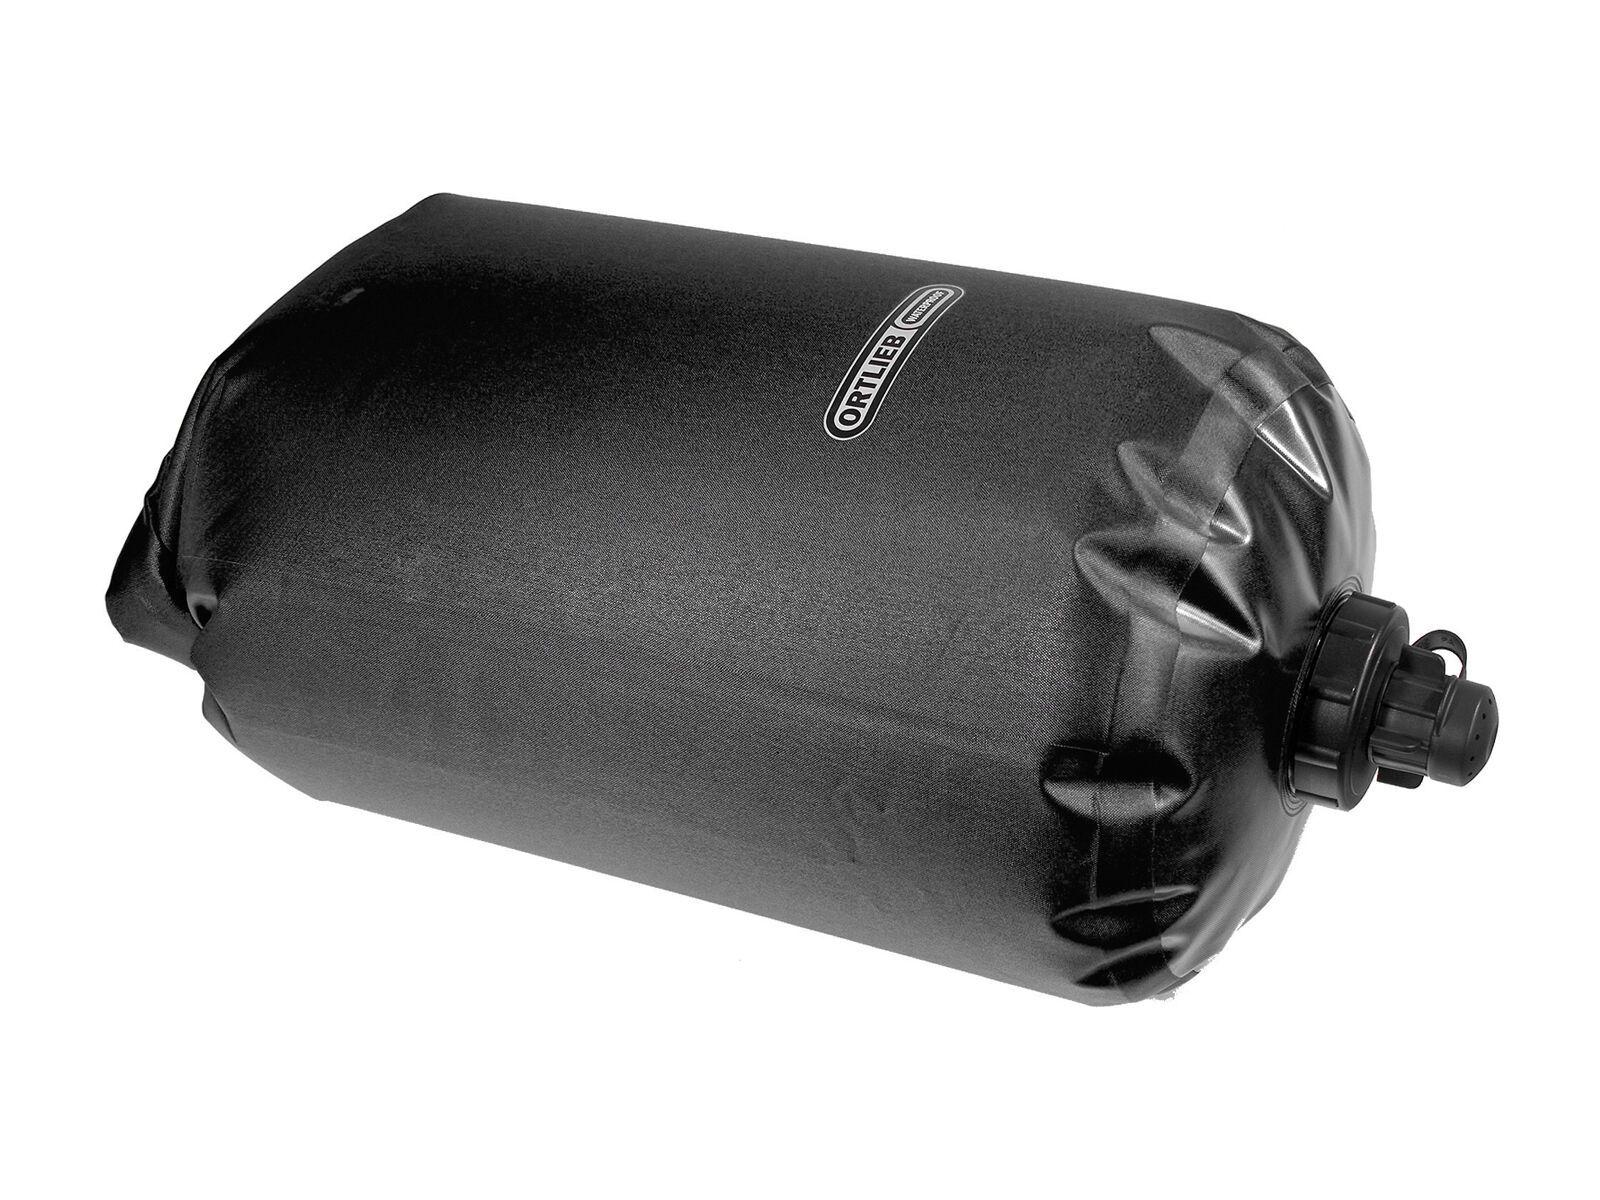 Ortlieb Water-Sack 10 L, black - Wassersack N27